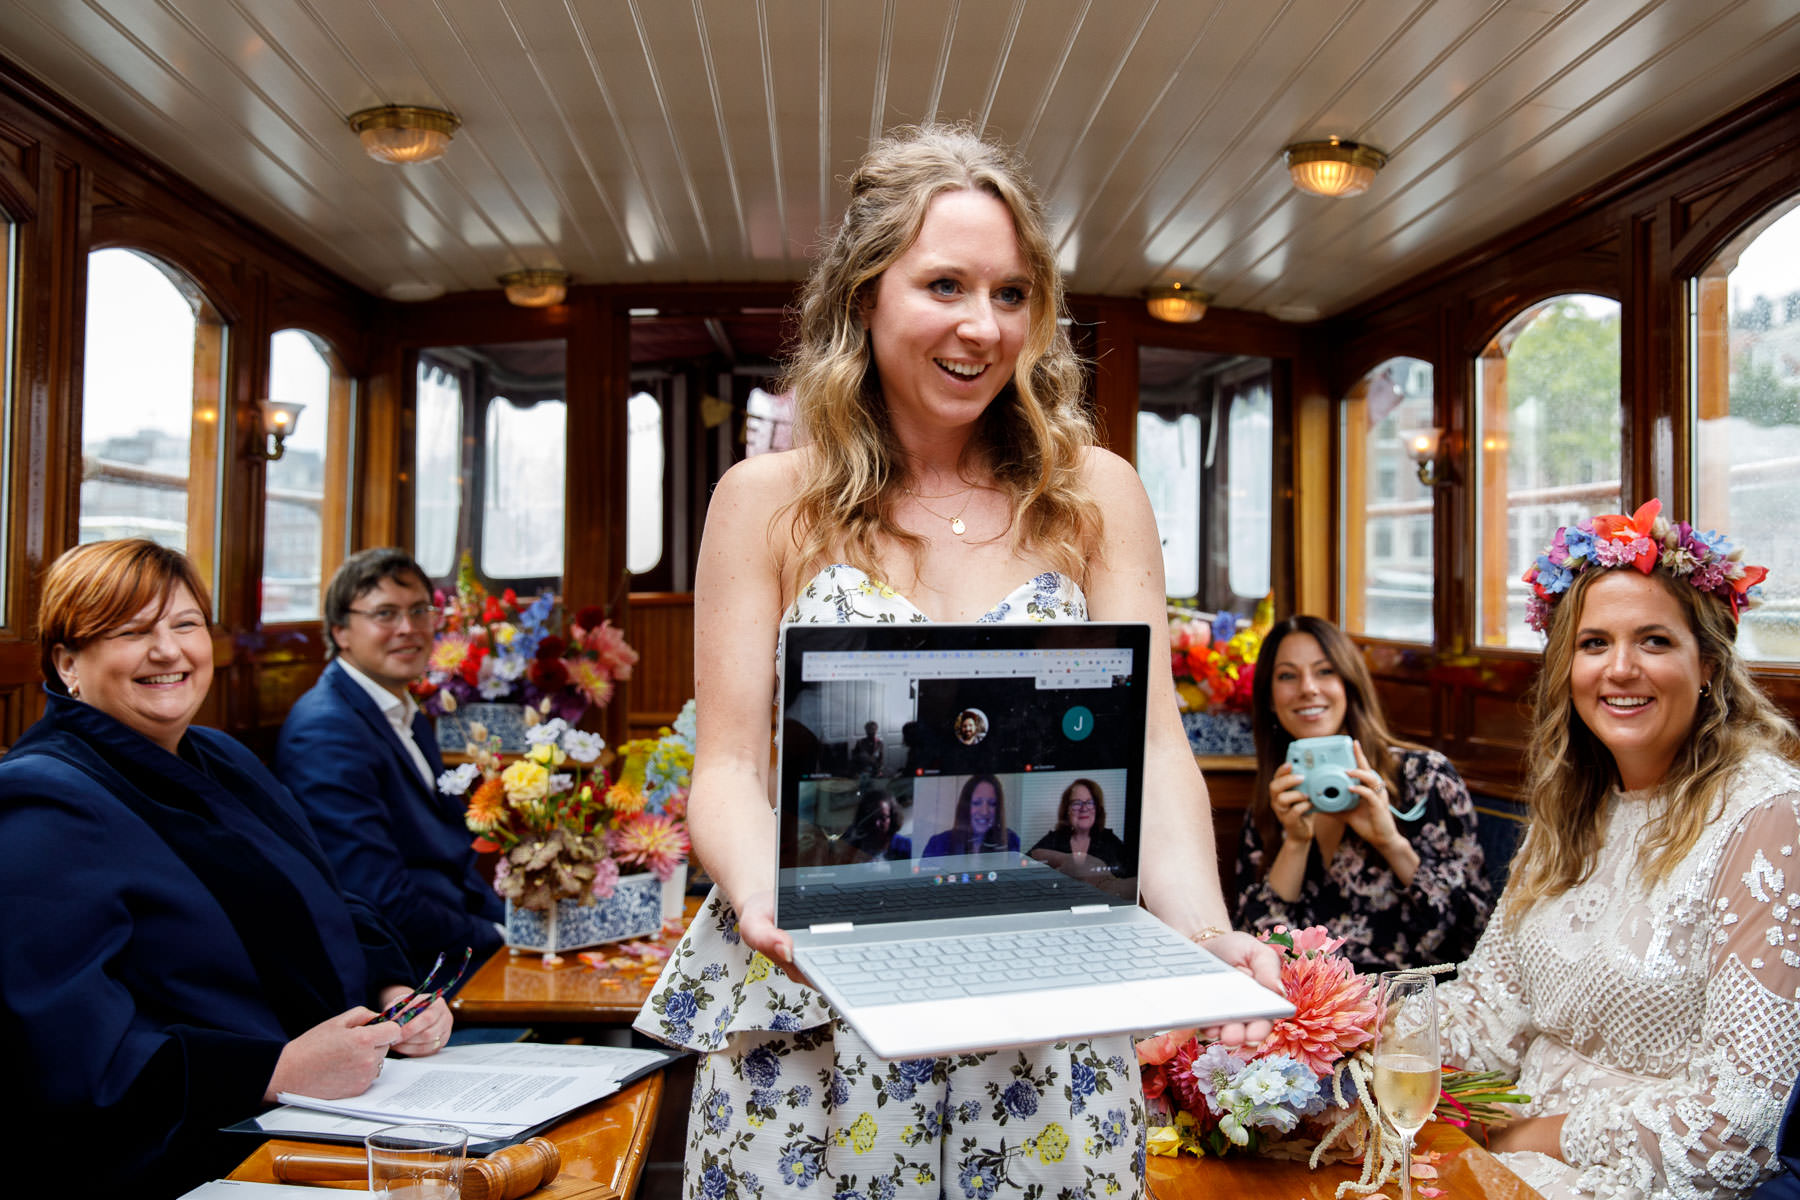 Trouwen in coronatijd | Coronabruiloft | Livestream bruiloft